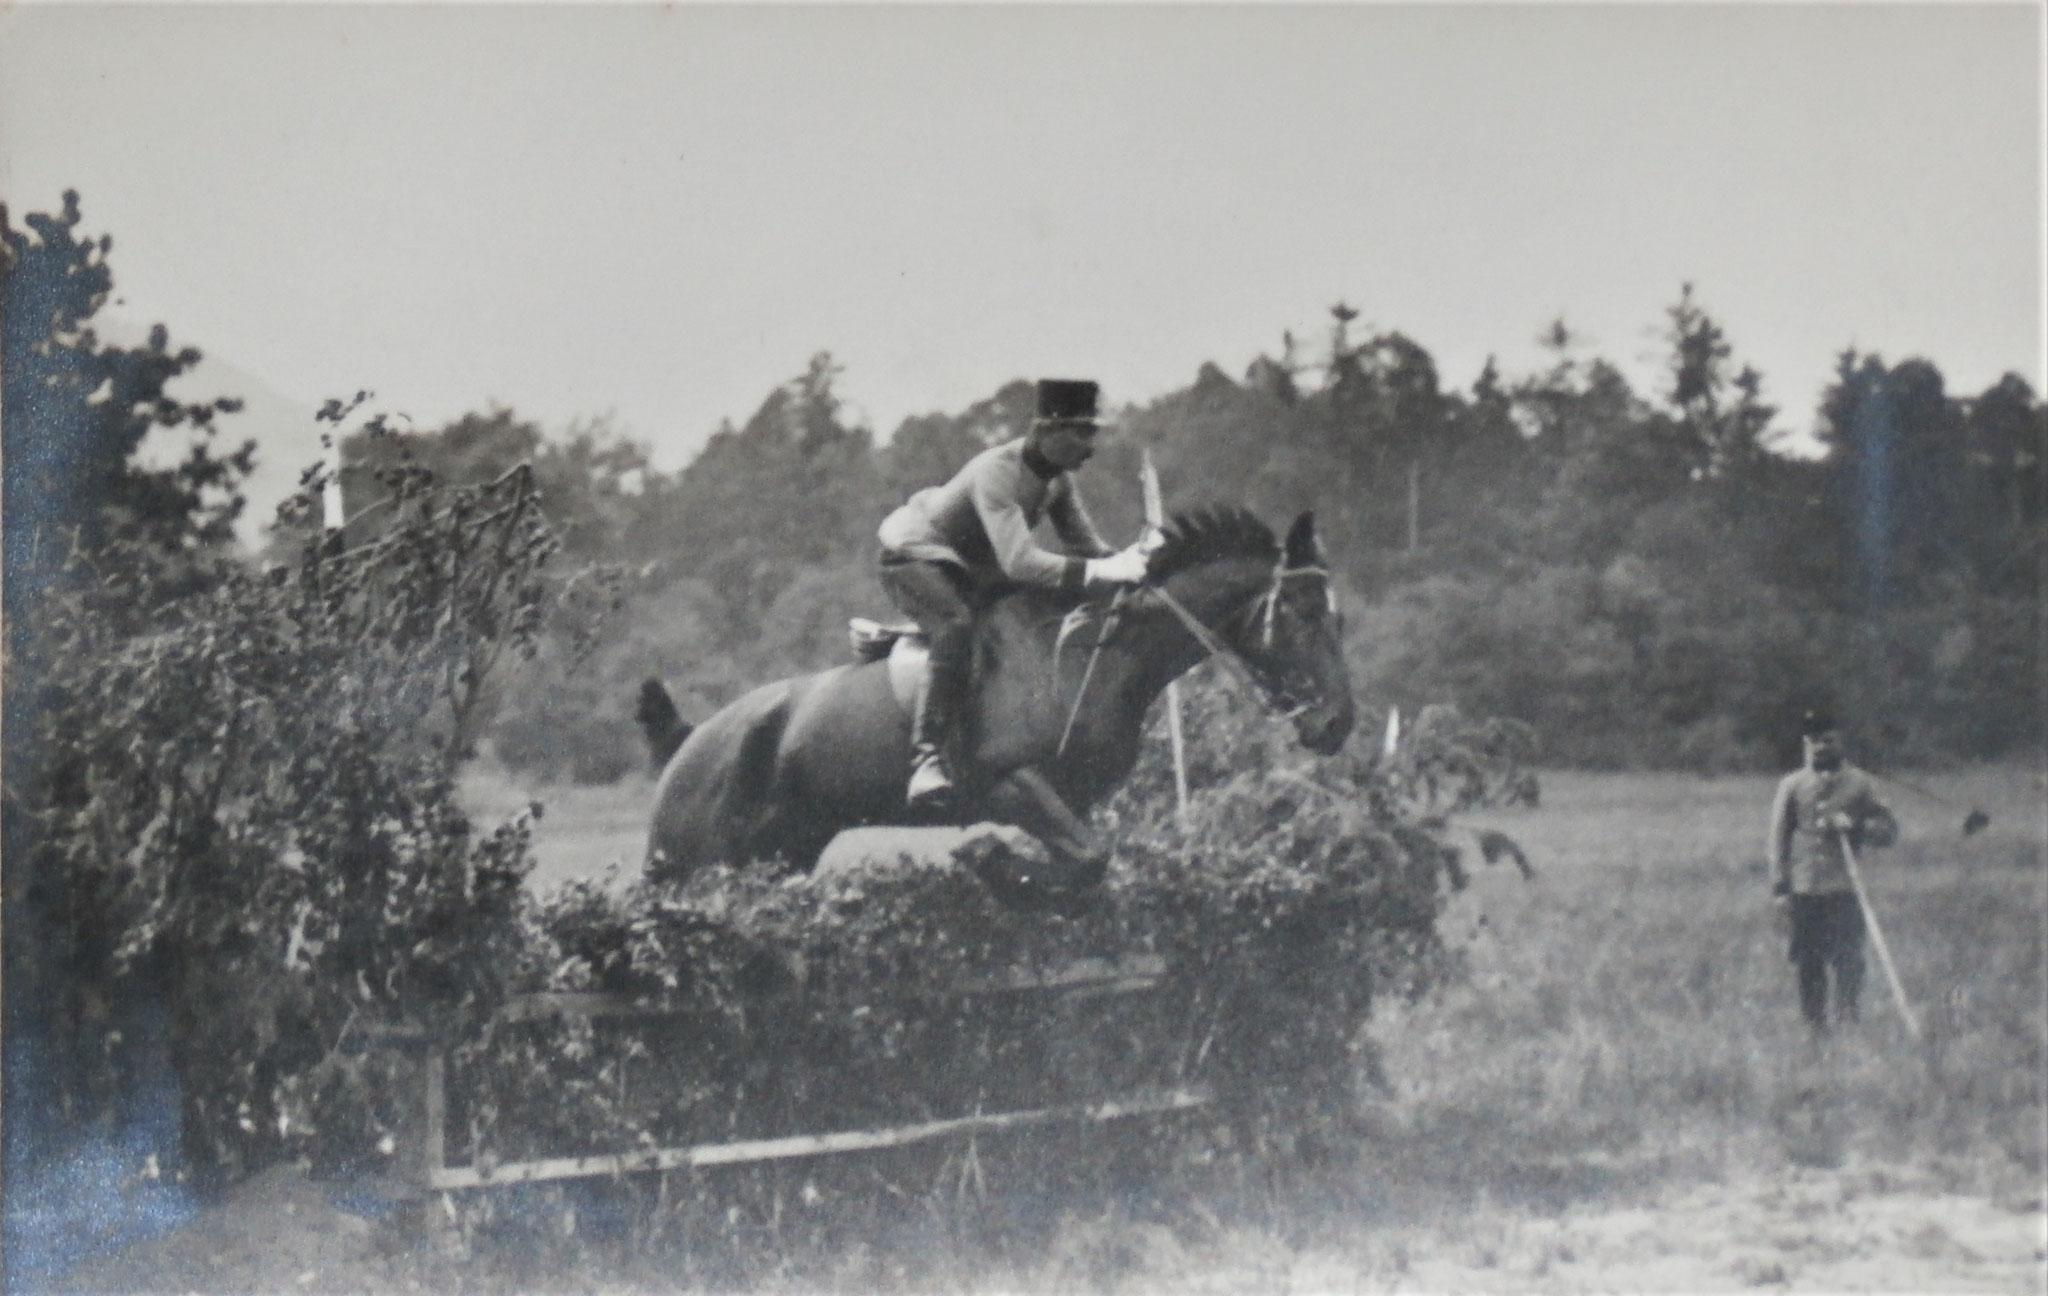 Oberleutnant Bregant